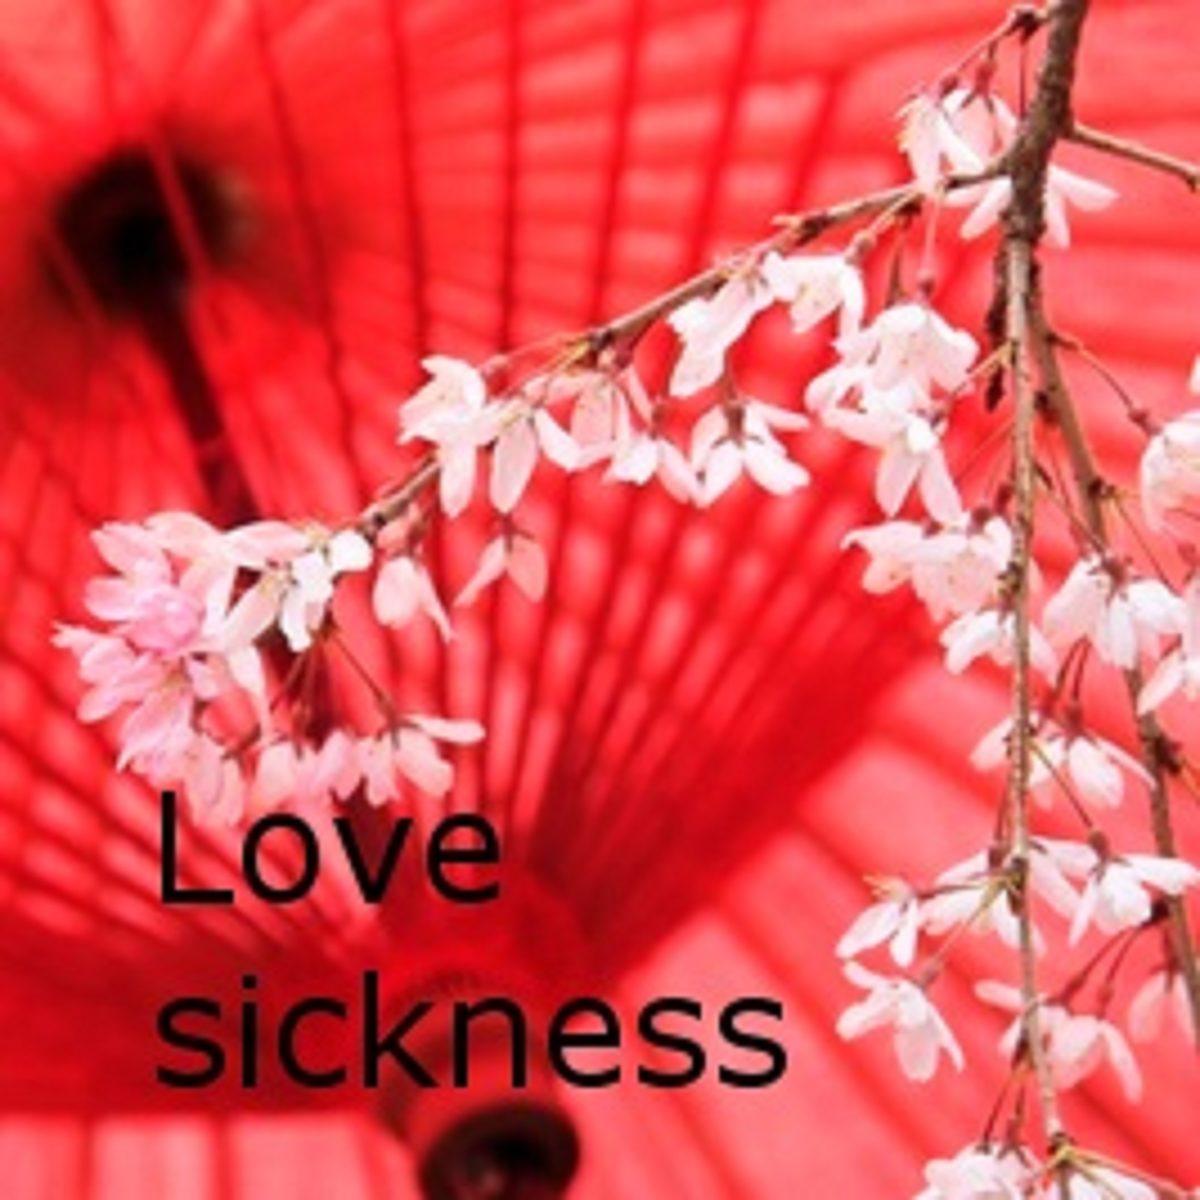 sou.universeのオリジナル曲の Love sickness